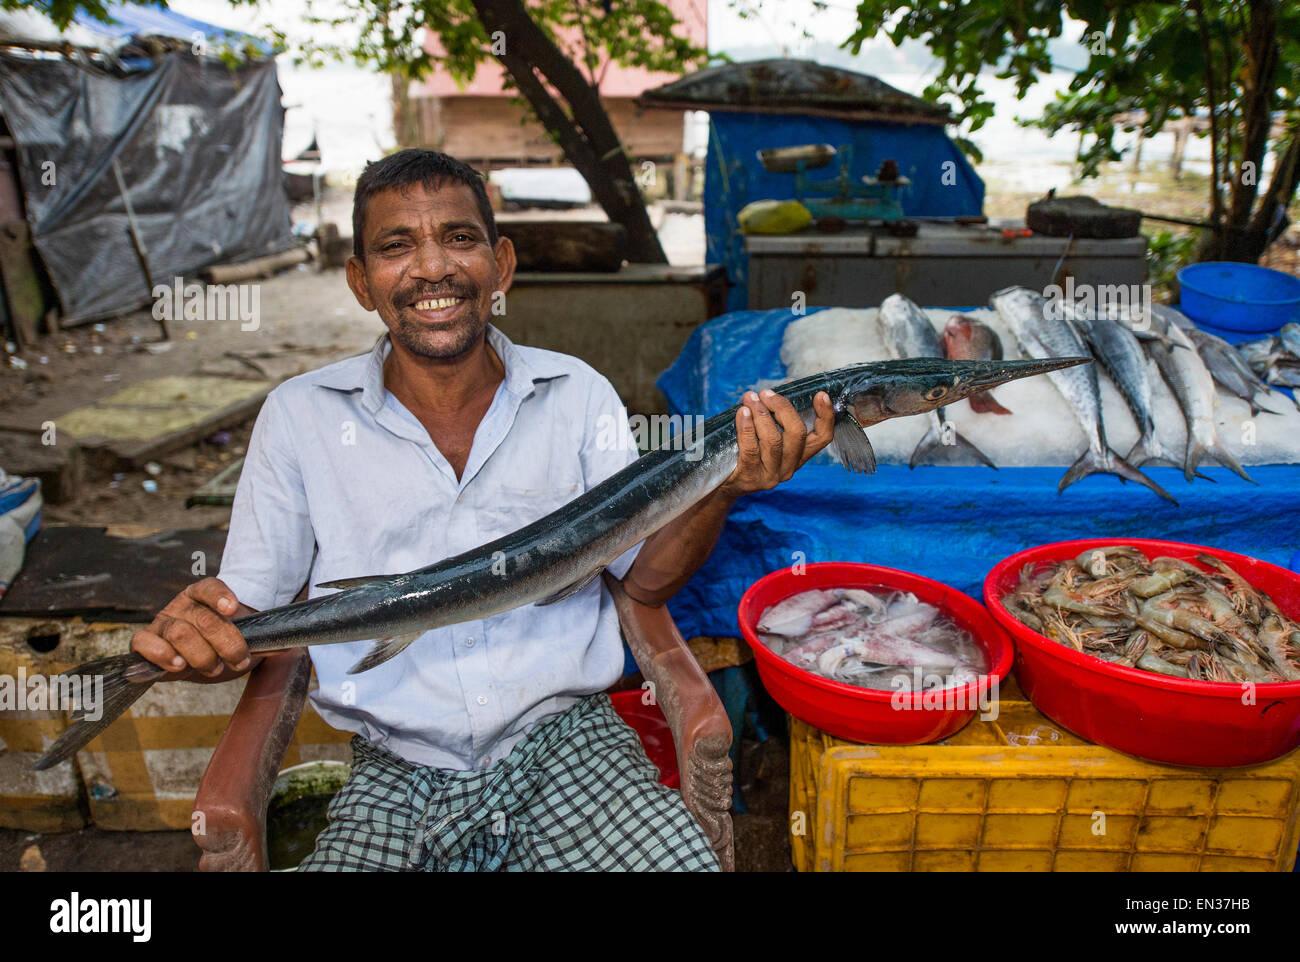 Fish seller holding a Freshwater Garfish (Xenentodon cancila), Fort Kochi, Kerala, India - Stock Image